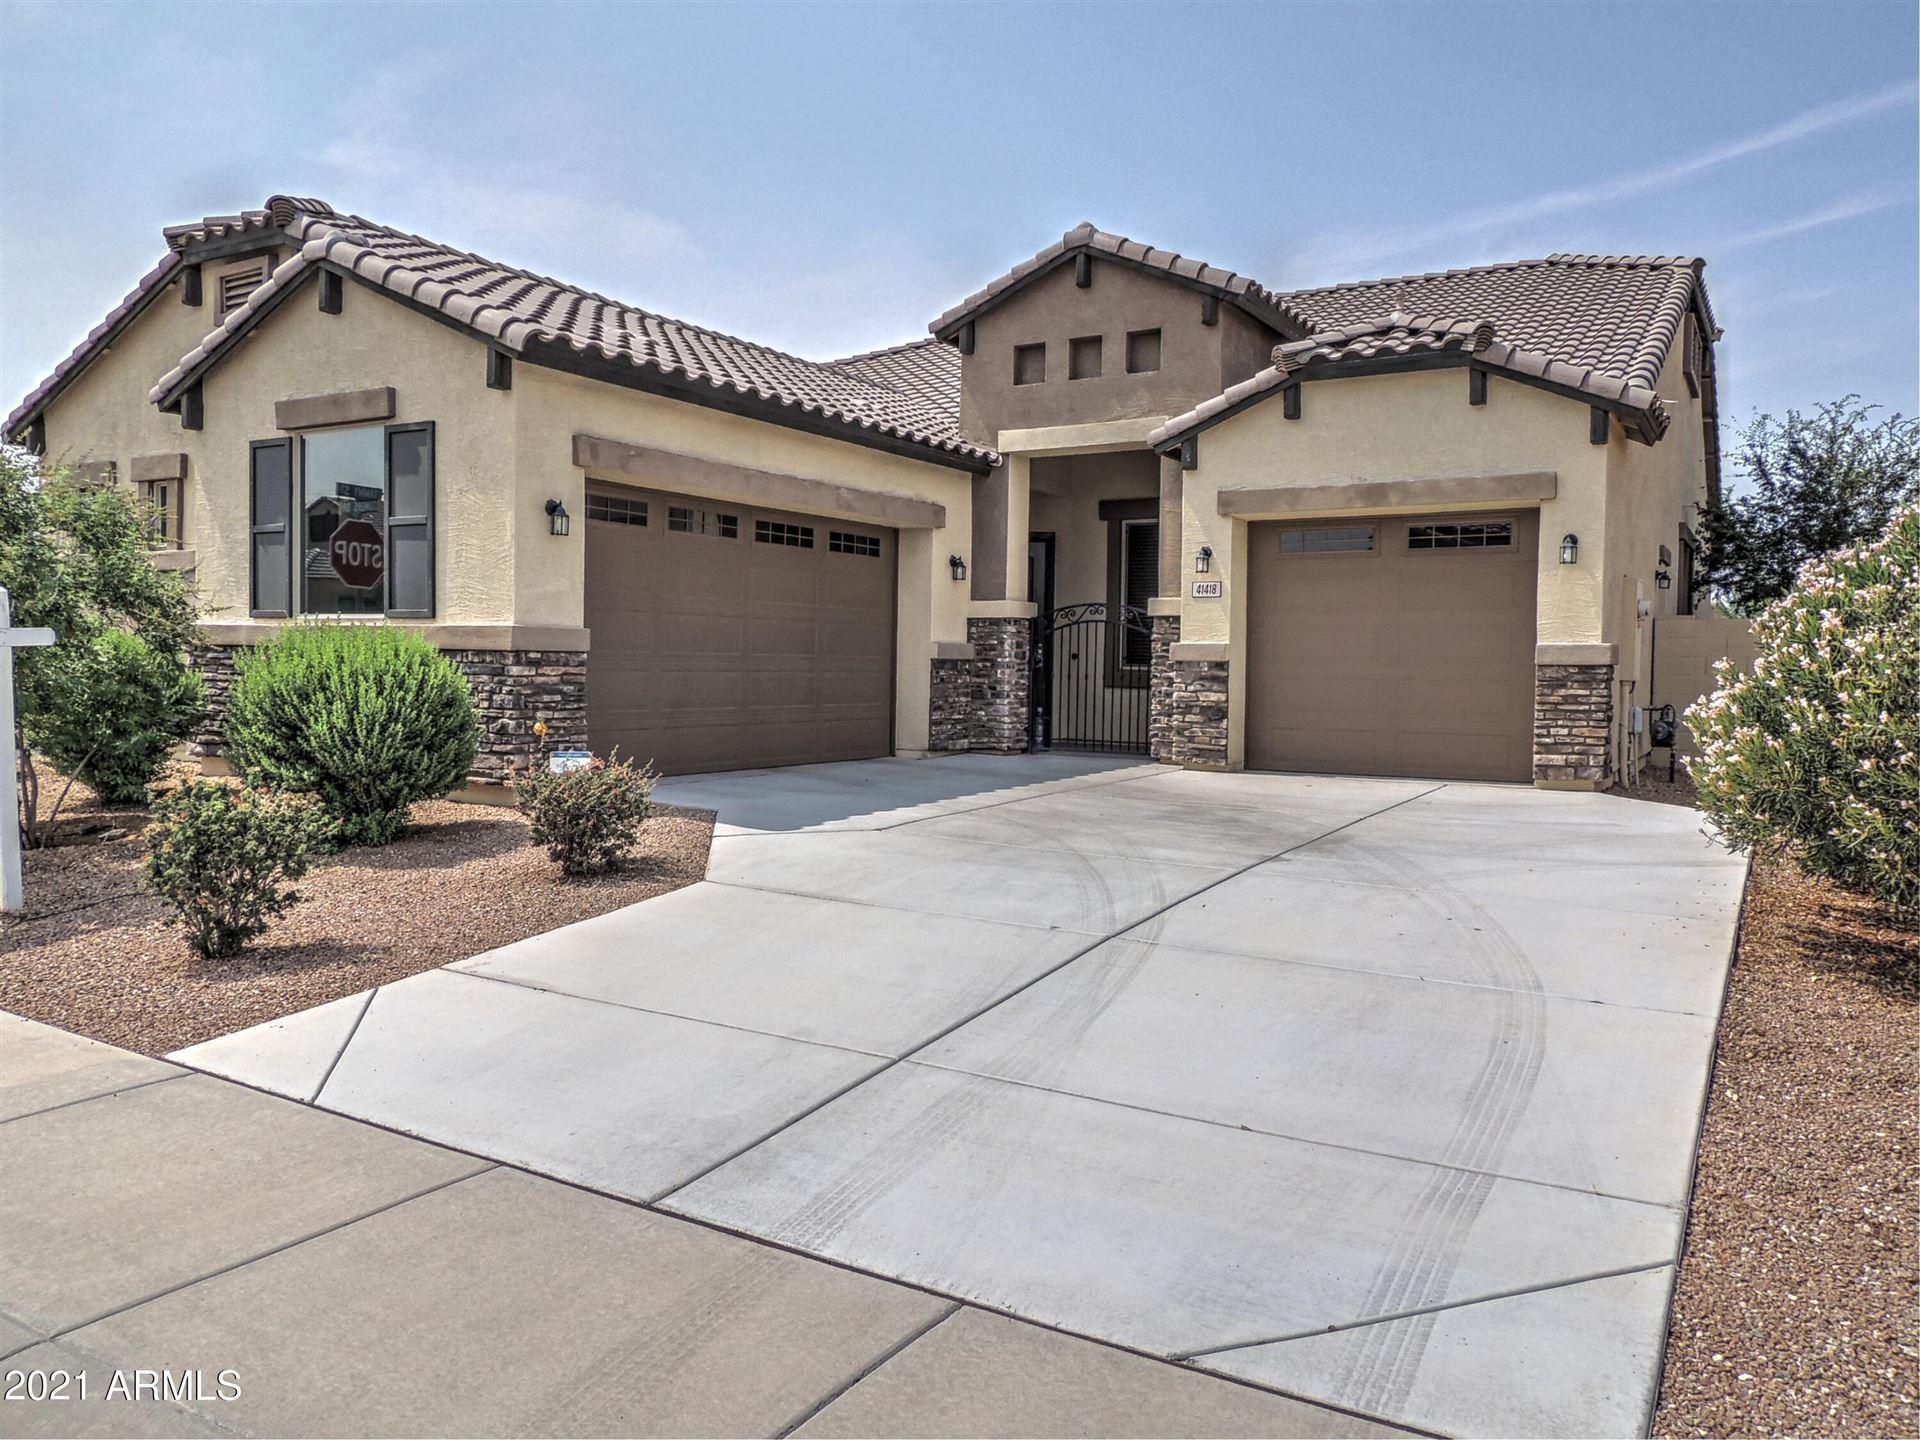 Photo for 41418 W SOMERS Drive, Maricopa, AZ 85138 (MLS # 6253003)